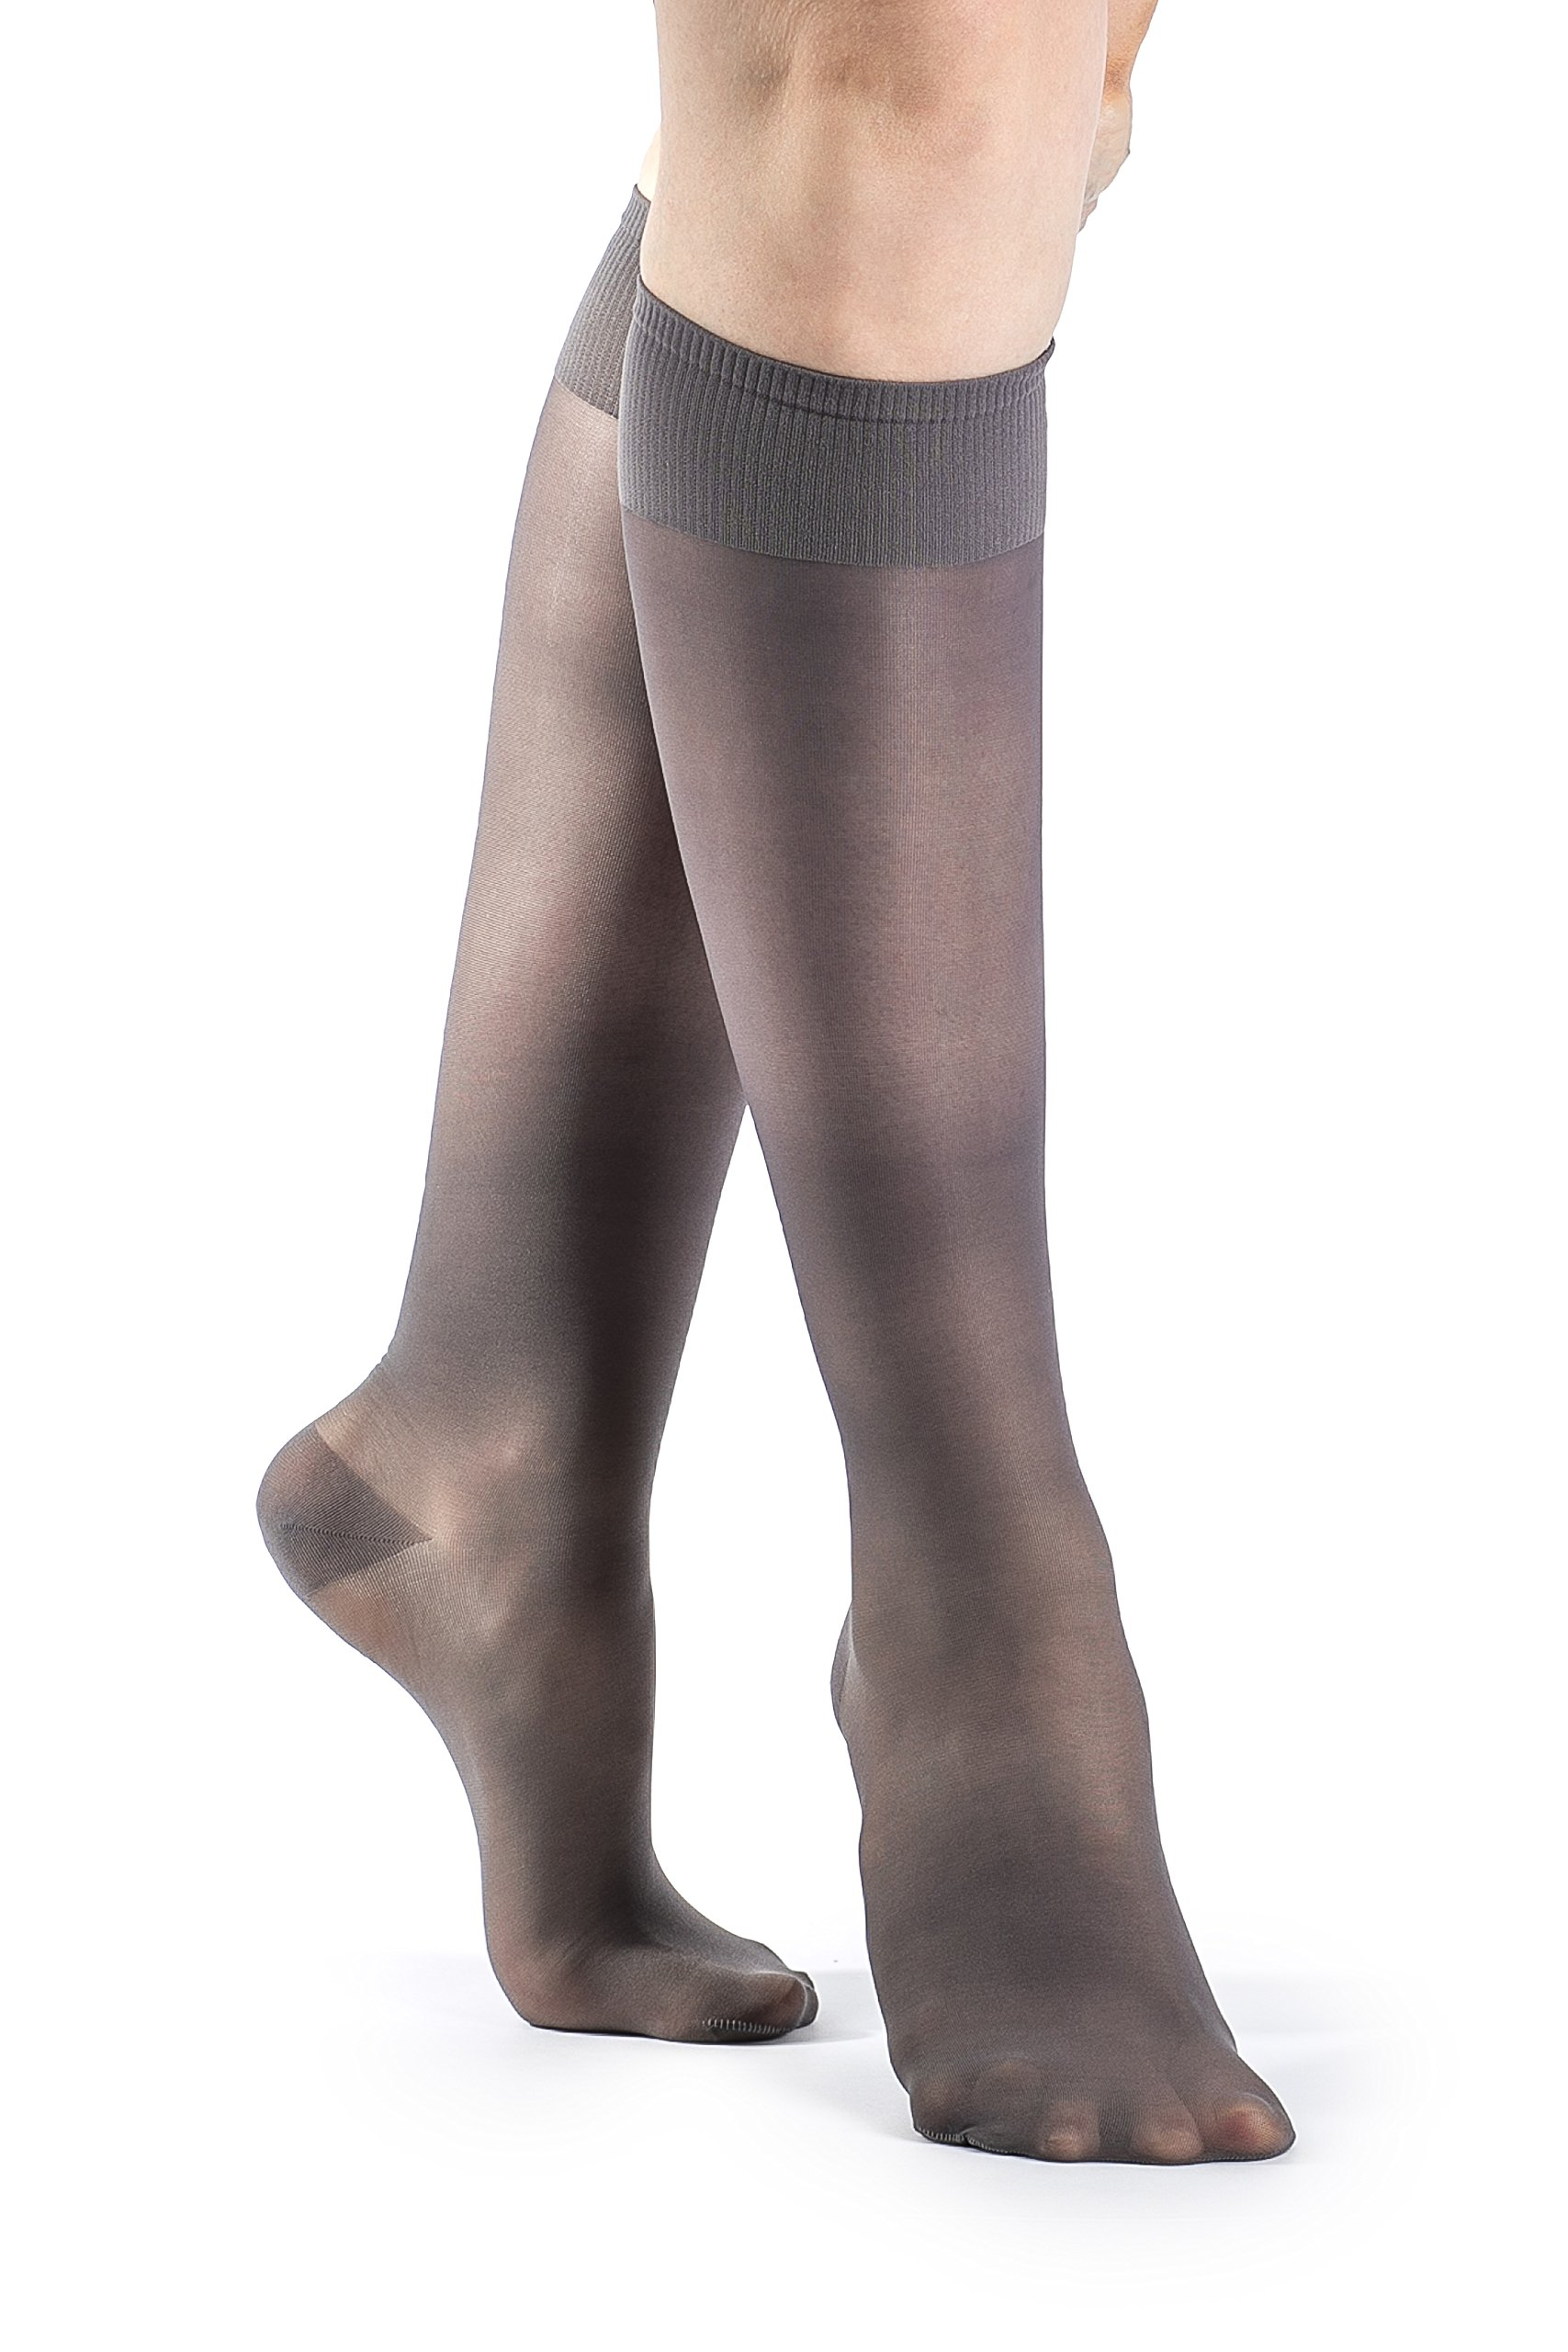 ab206f43f Amazon.com  SIGVARIS Women s SHEER FASHION 120 Closed Toe Calf Compression Hose  15-20mmHg  Health   Personal Care